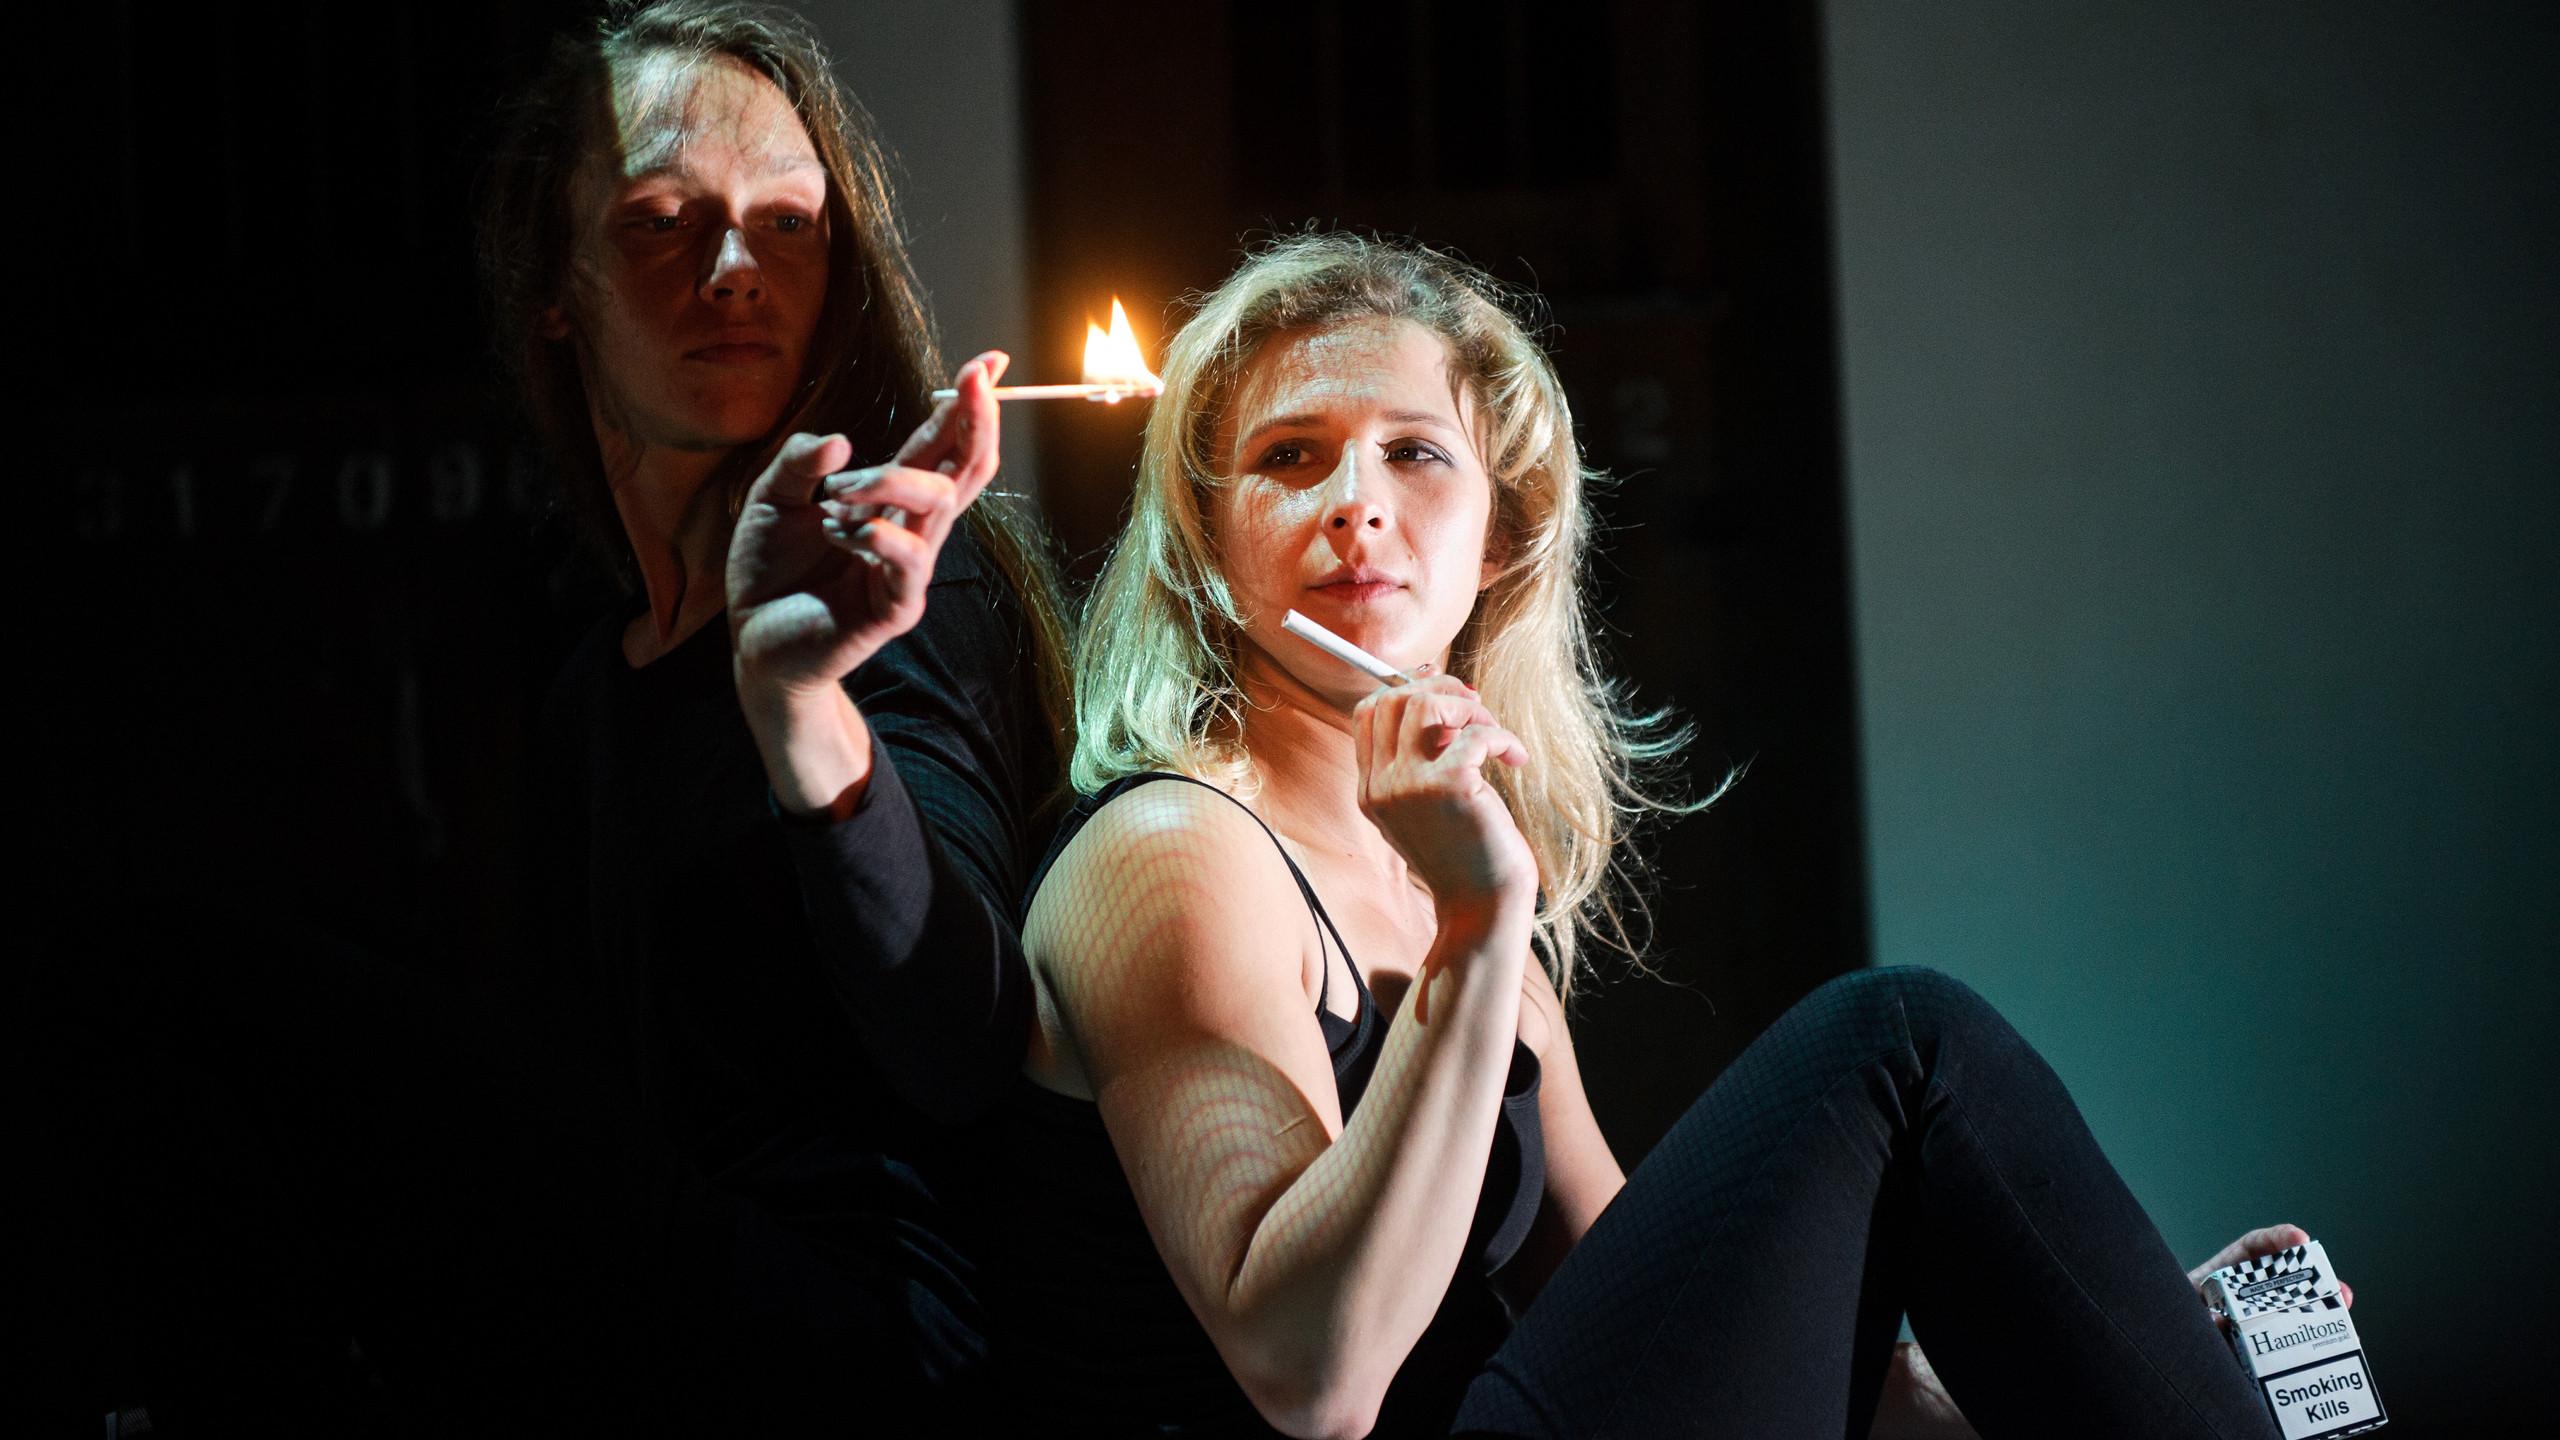 (c) Alex Brenner, Belarus Free Theatre - Burning Doors. Maryia Sazonava and Maria Alyokhina.